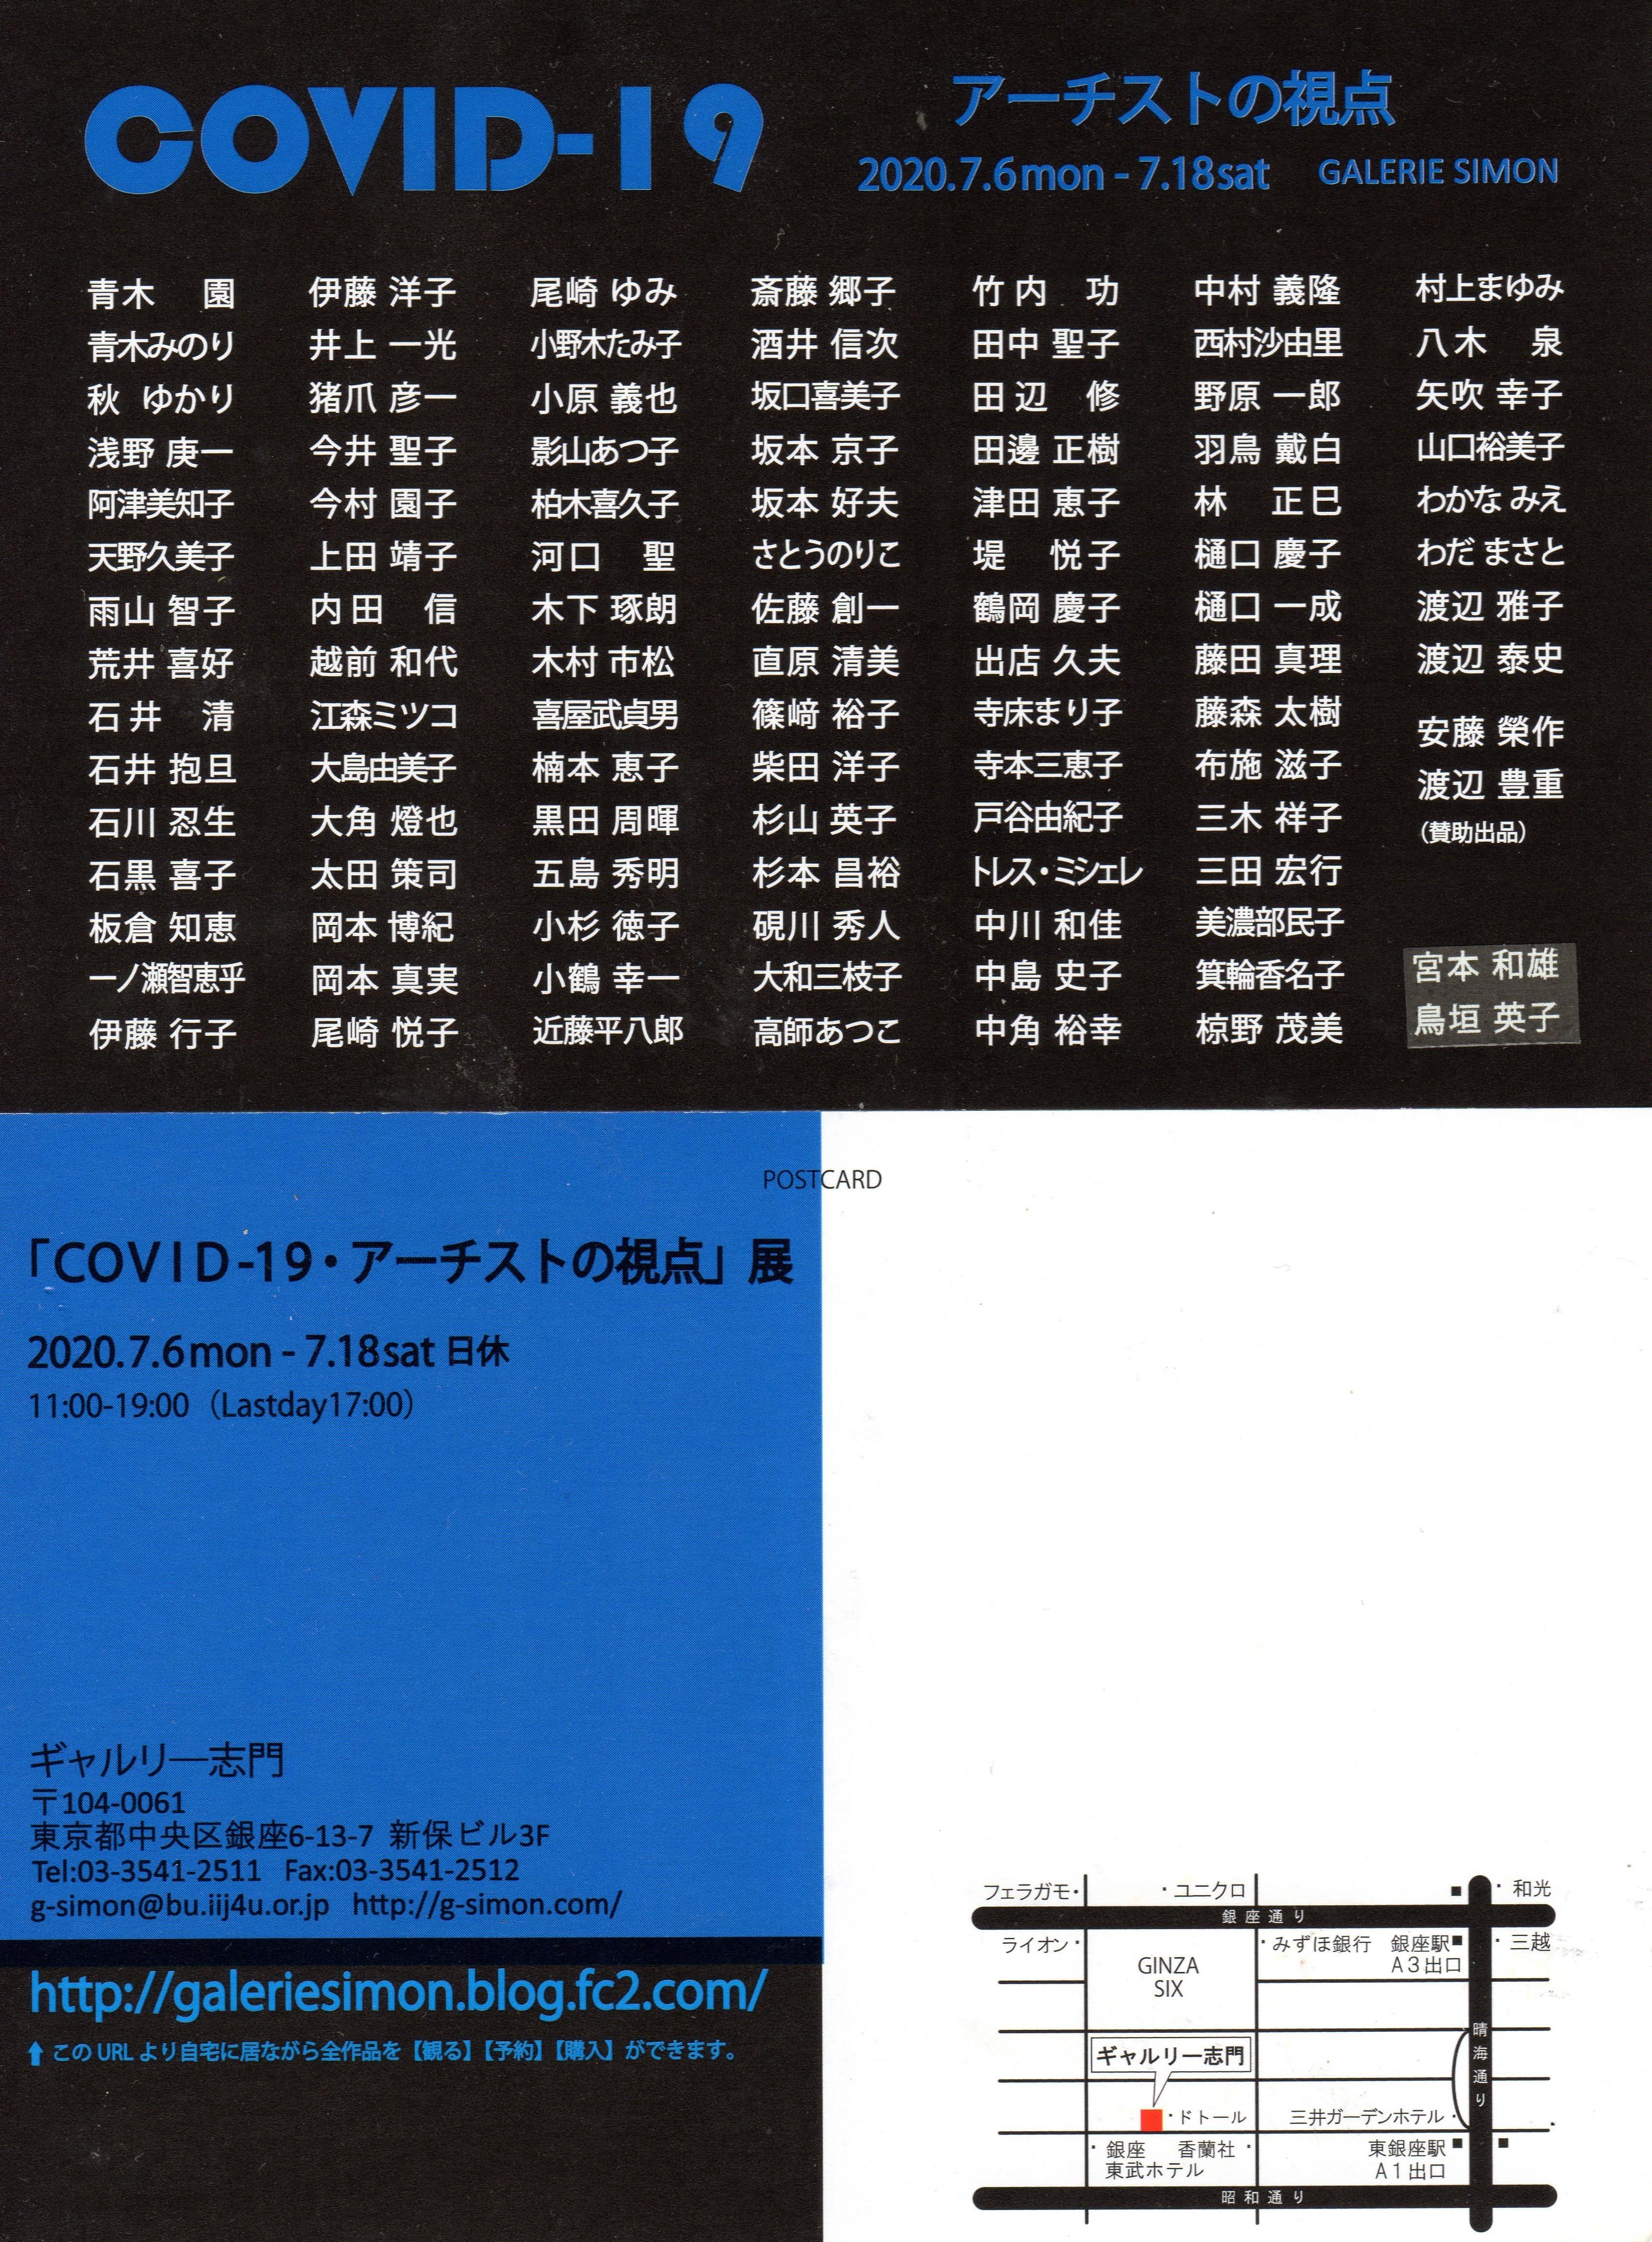 [COVID-19・アーチストの視点] 展 2020/07/06 Mon - 2020/07/18 Sat (日休)